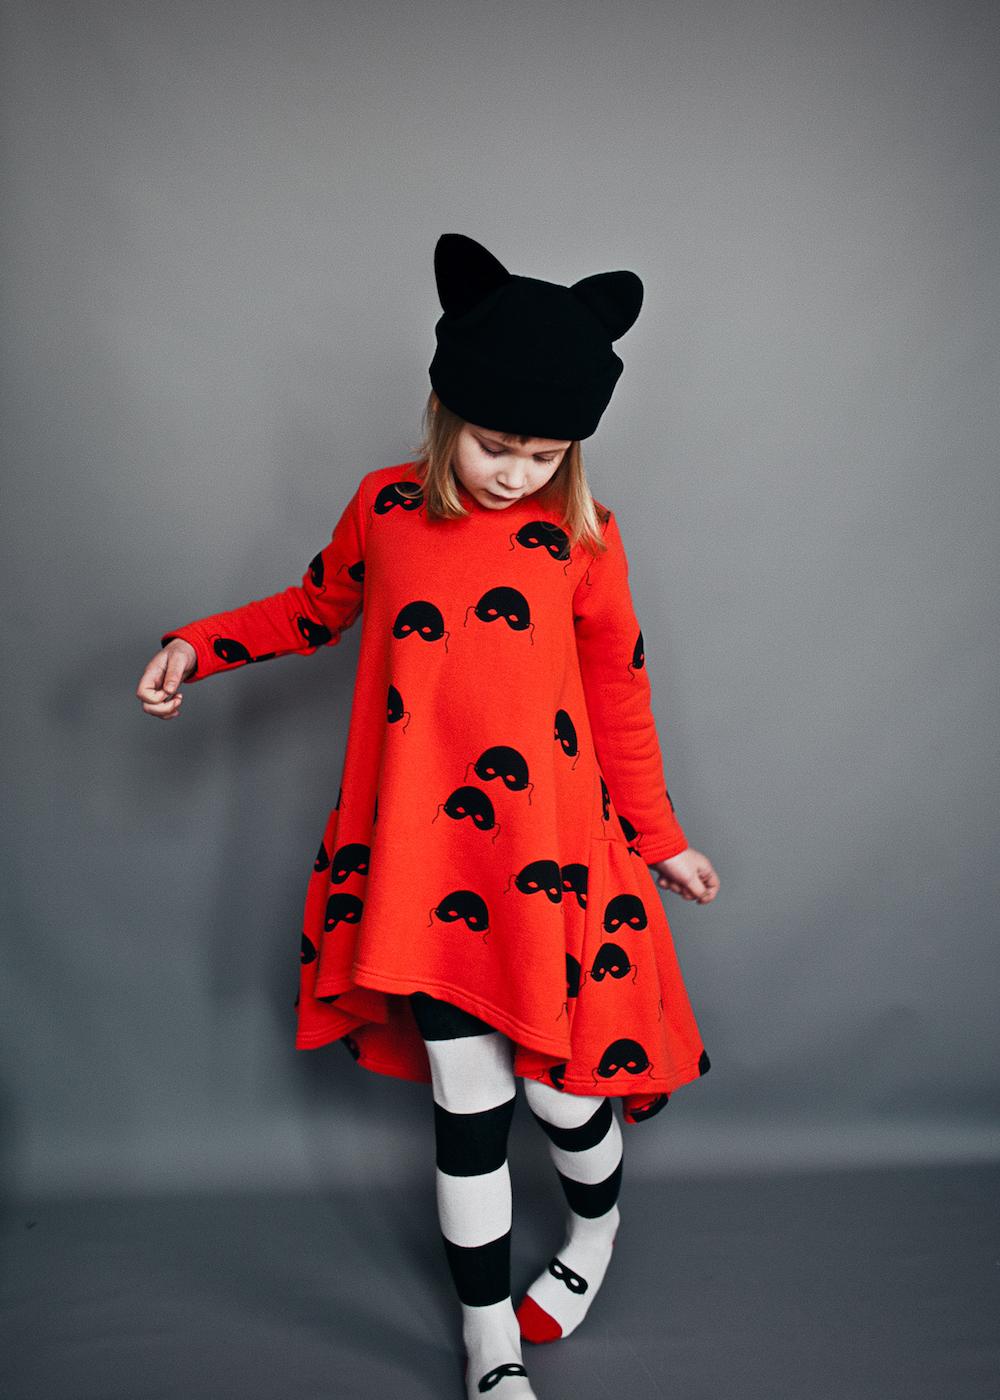 Beau-Loves-AW16-Red-Dress-Black-White-Stripe-Tights